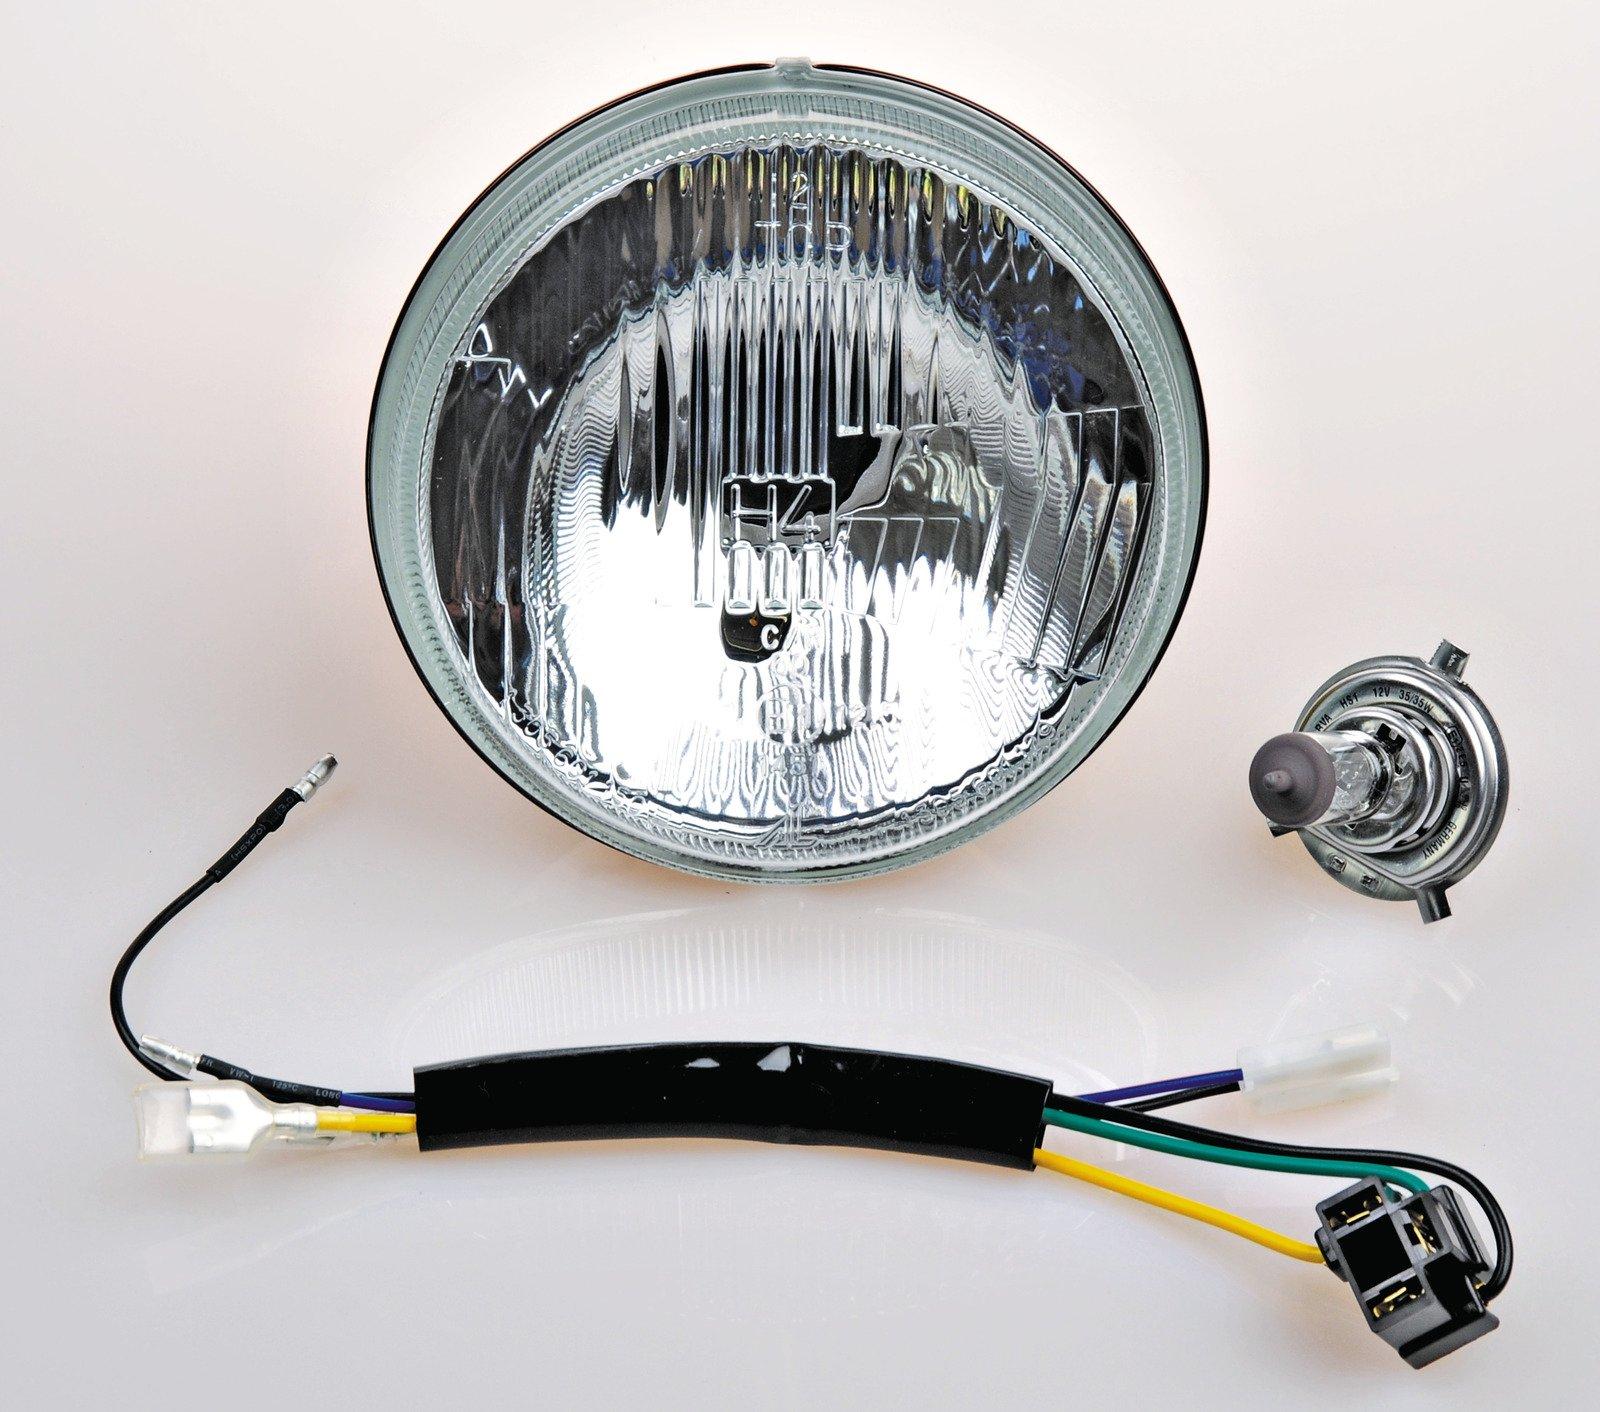 hight resolution of yamaha 1976 1981 xt500 6v h4 headlight conversion kit 10 013